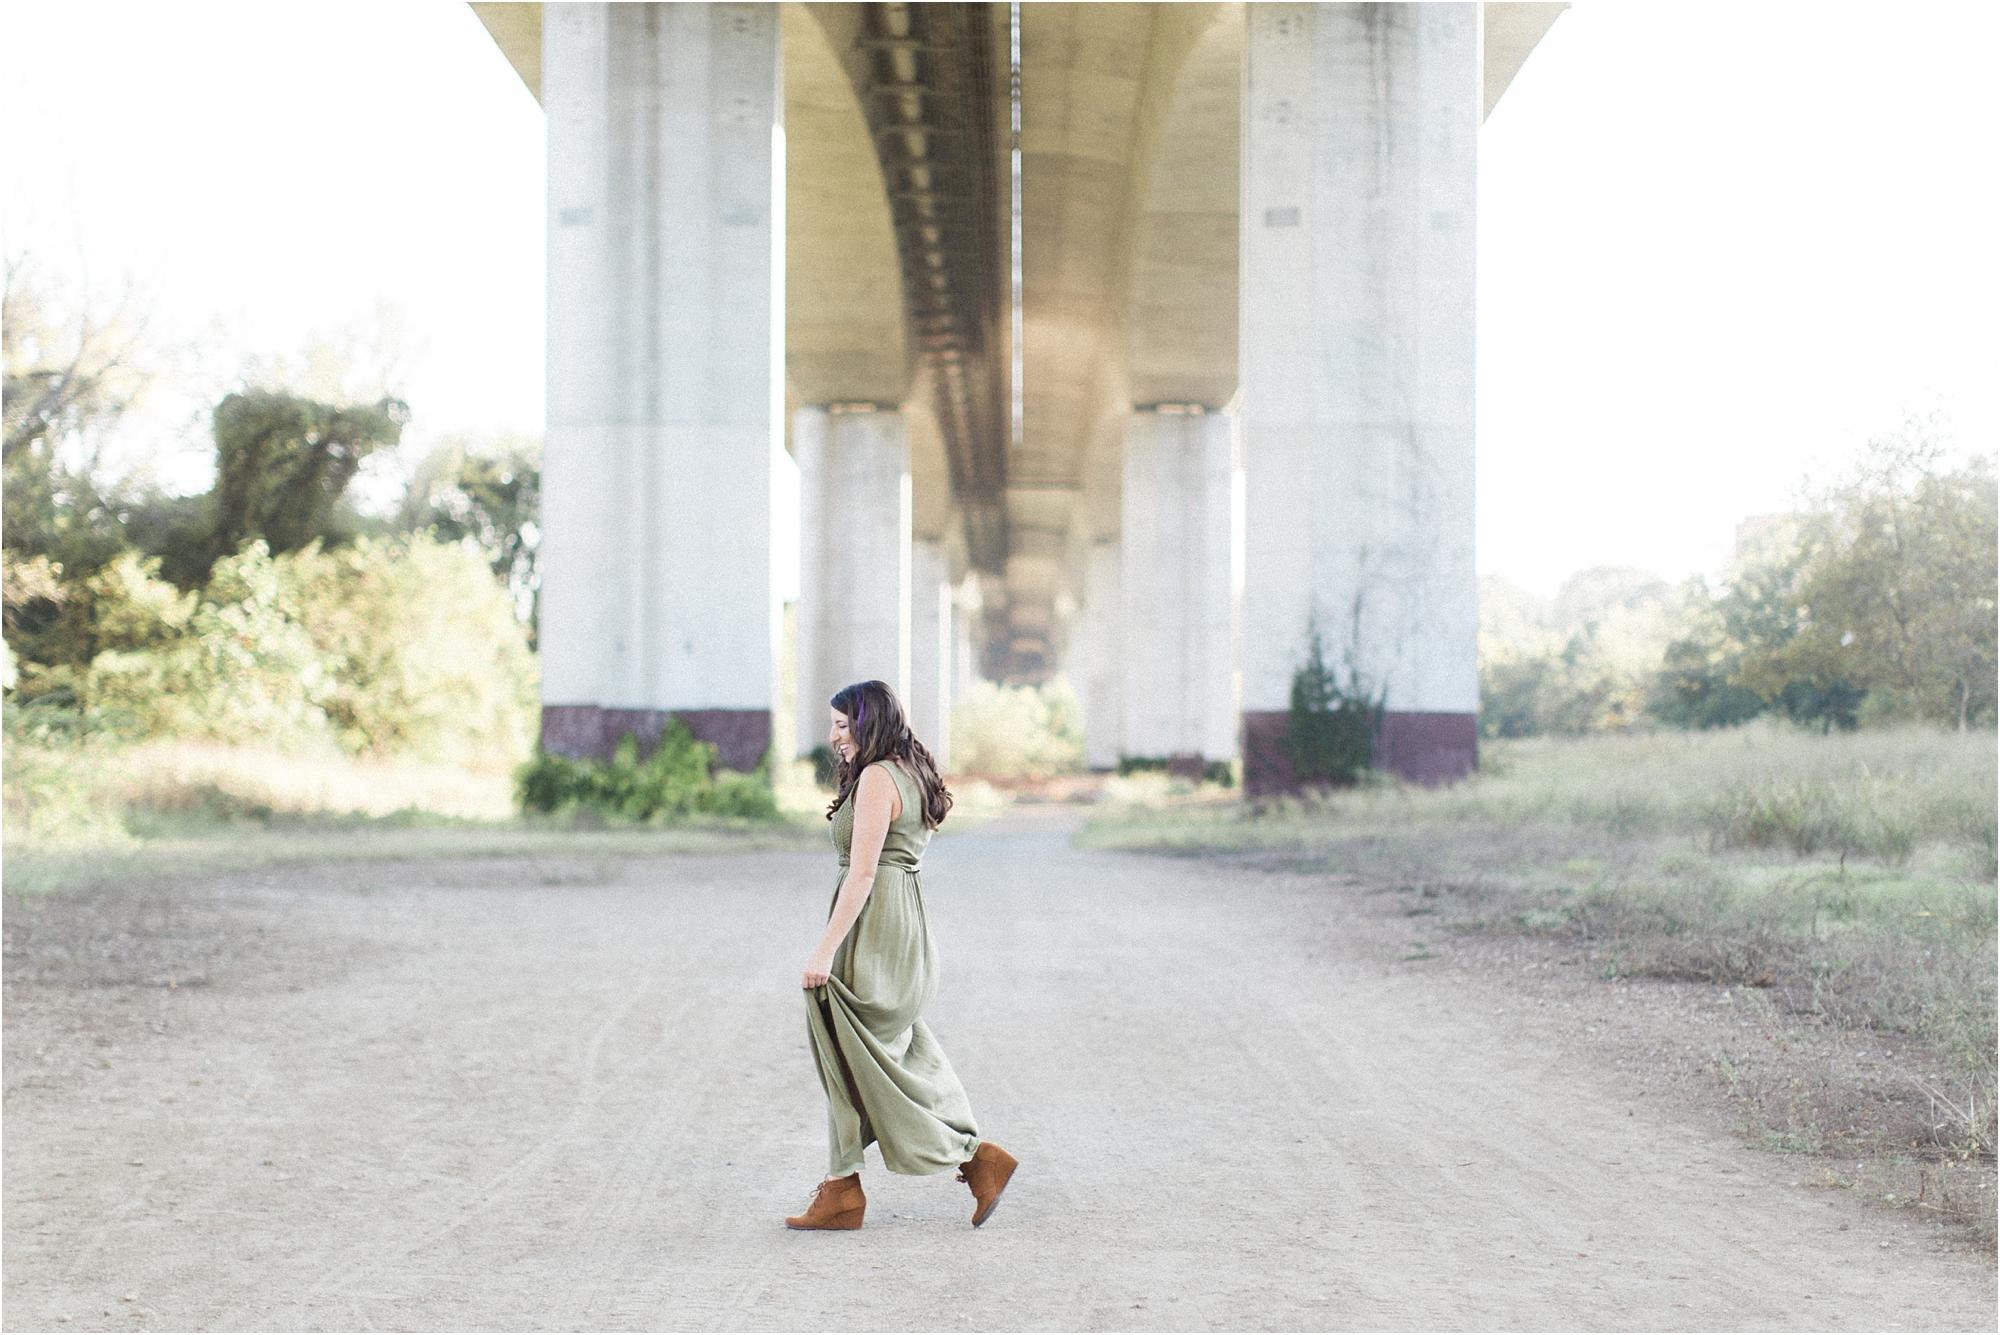 stephanie-yonce-photography-headshots-belle-isle-richmond-va_0001.jpg